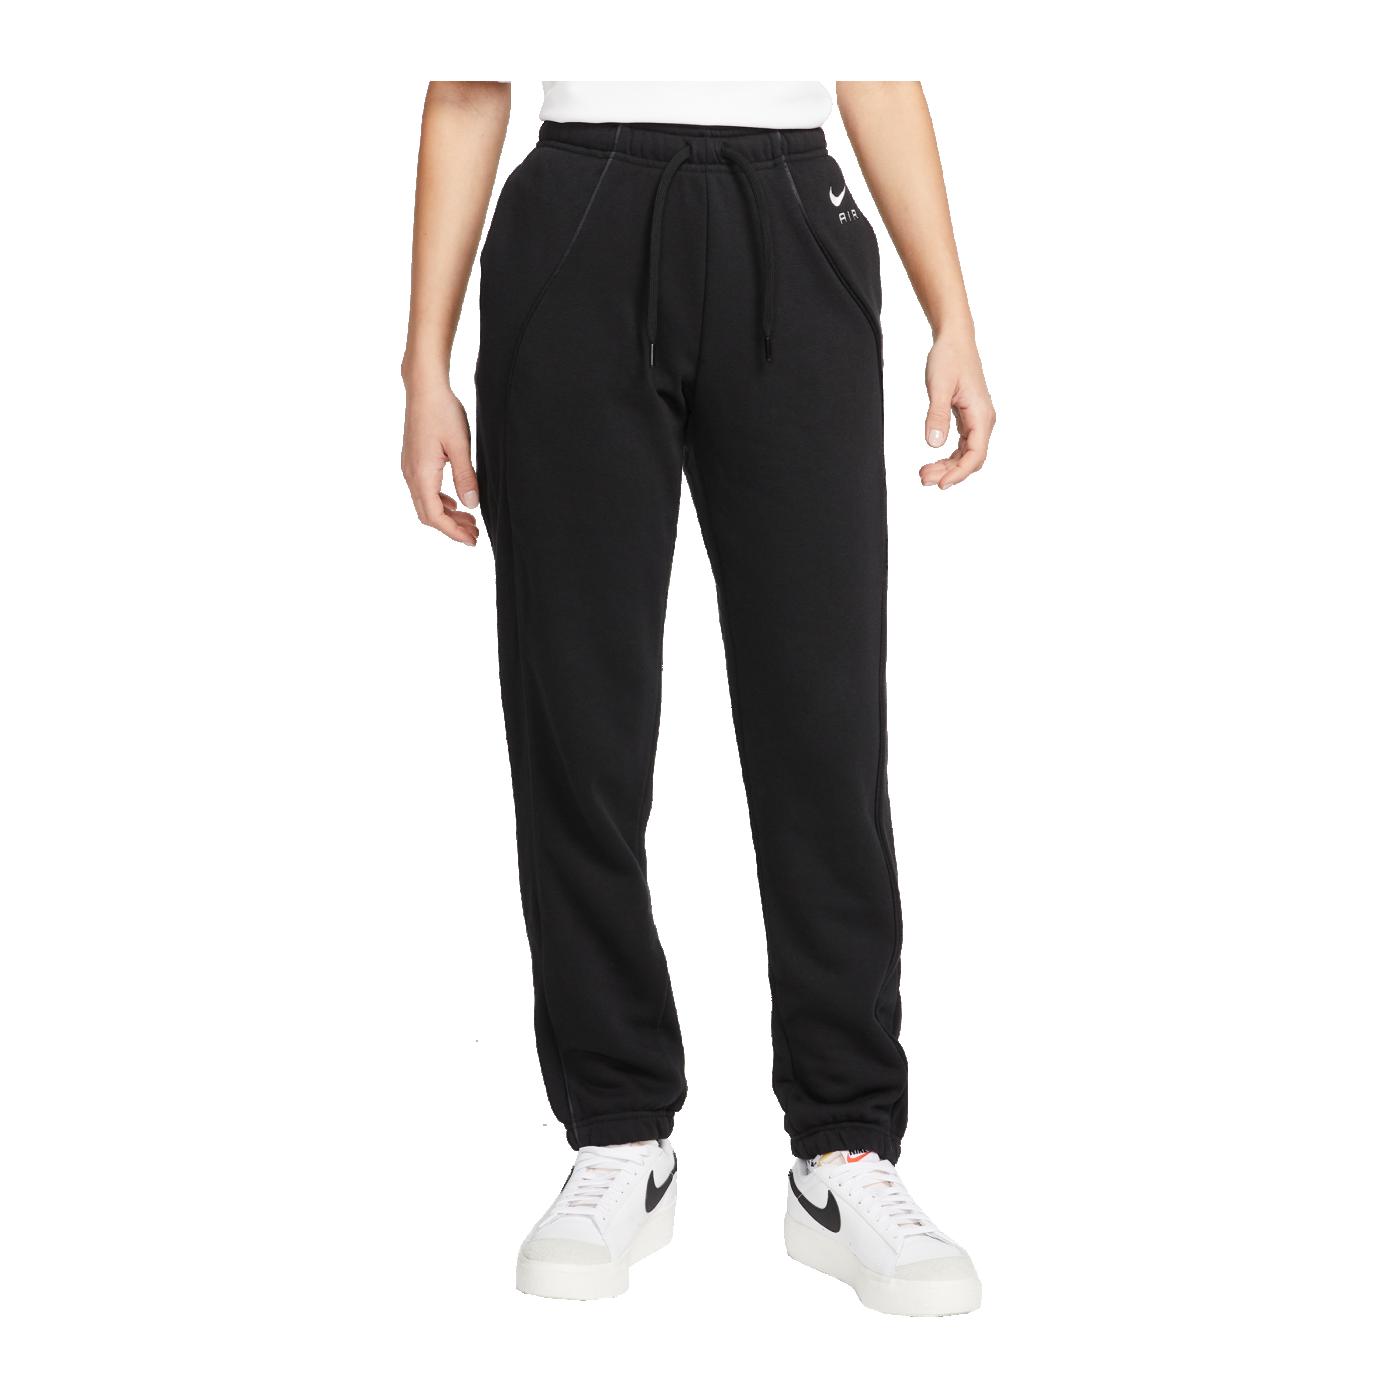 Nike Air Fleece Jogginghose Damen Schwarz F010